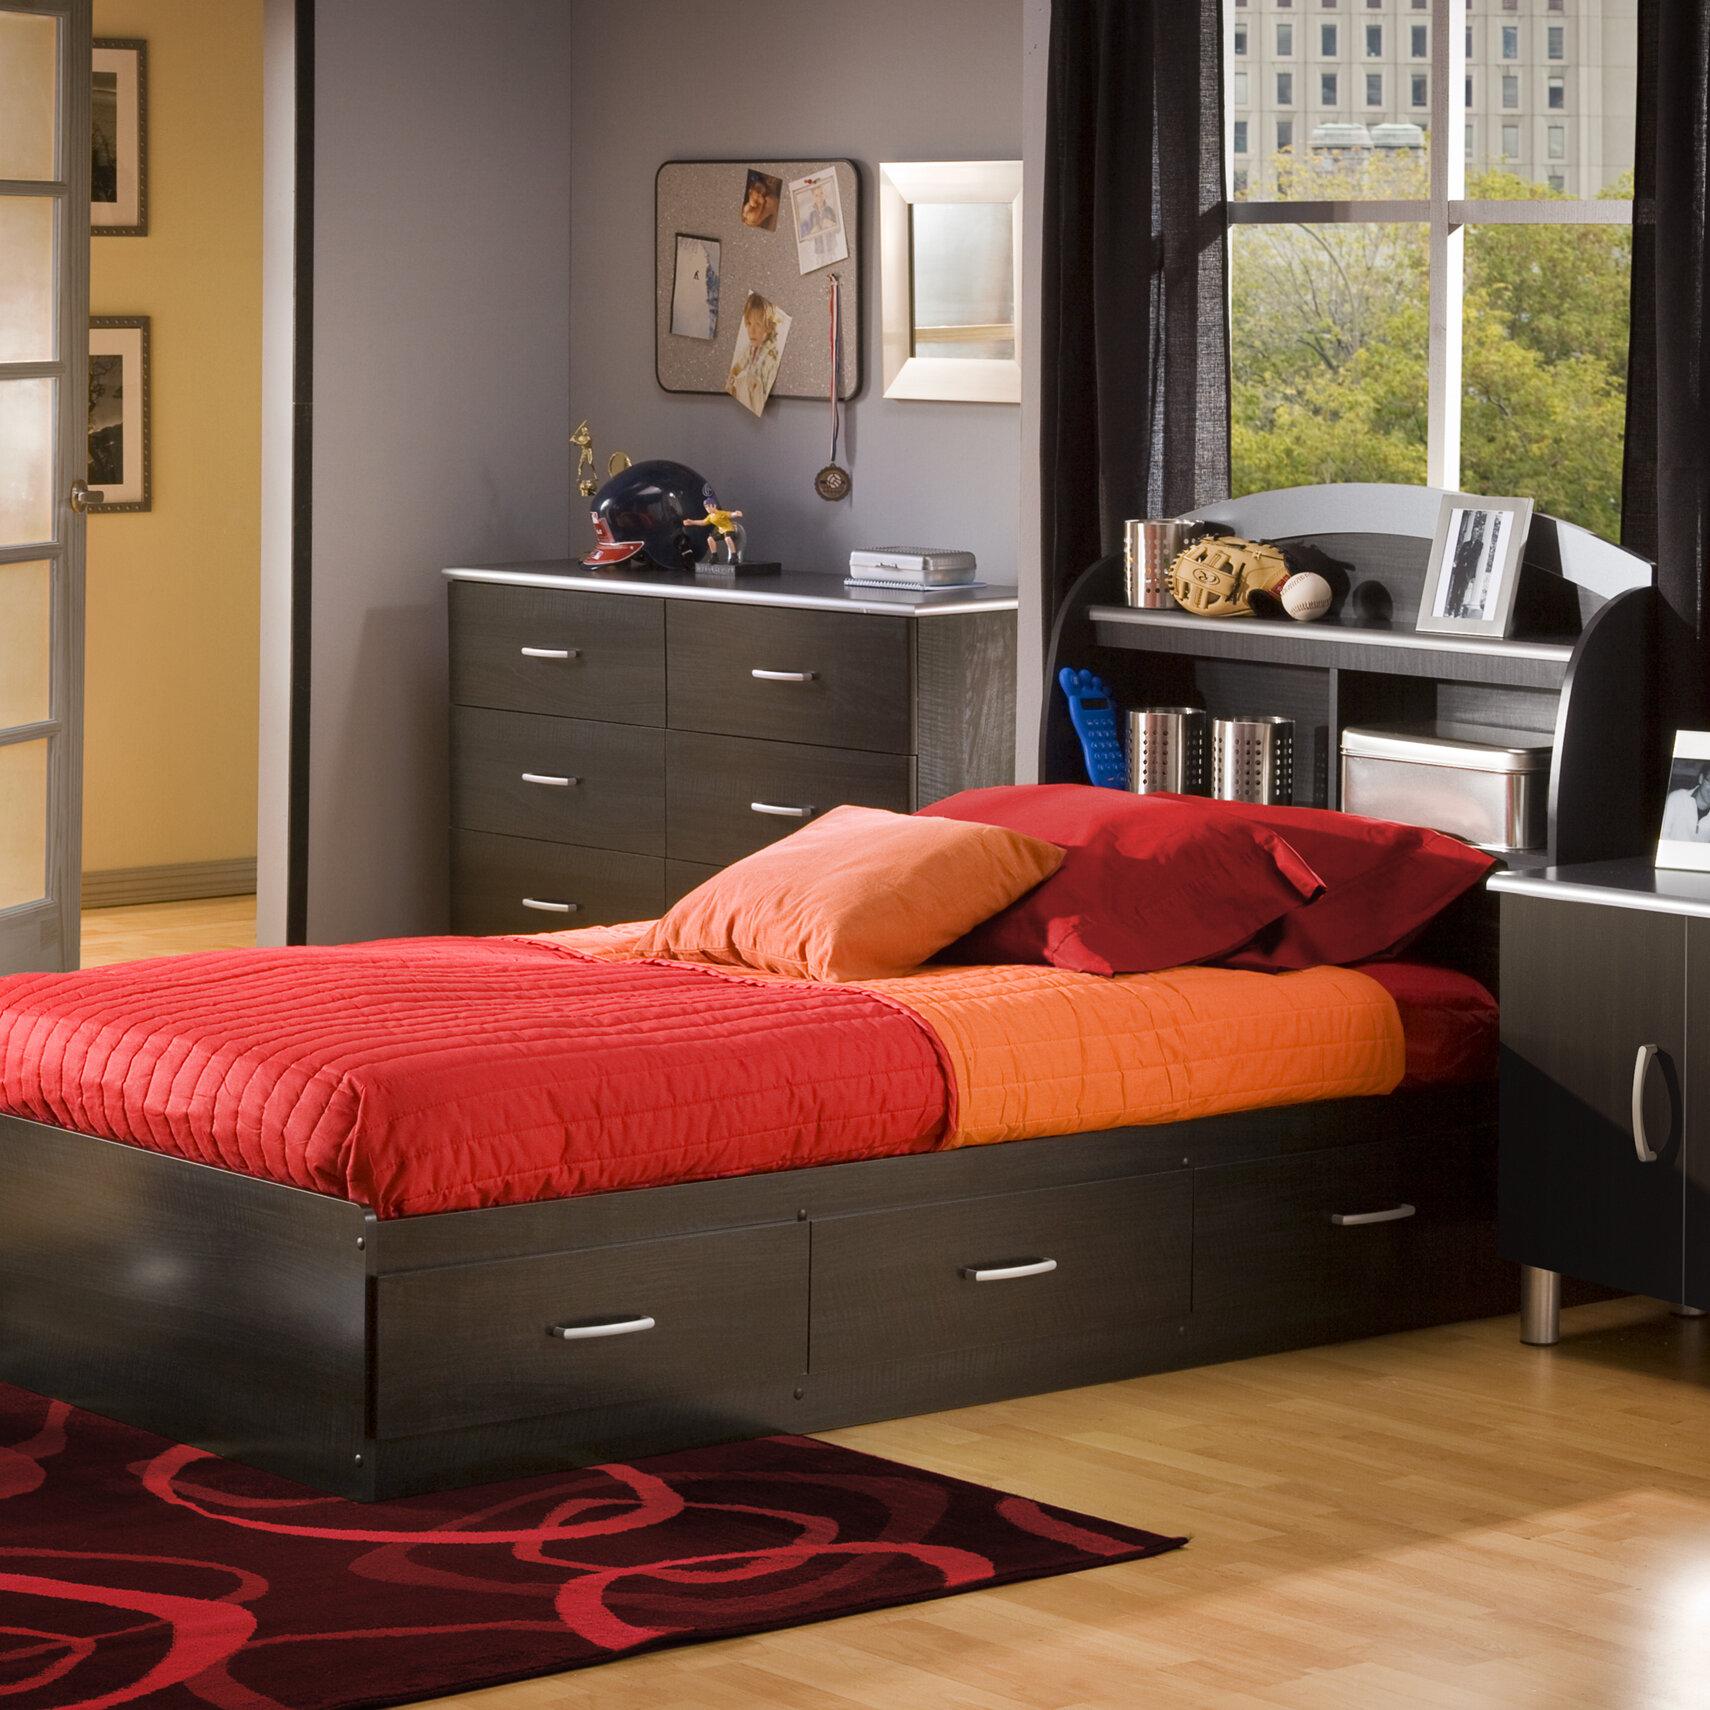 sophisticated lexington bedroom furniture. Sophisticated Lexington Bedroom Furniture 3